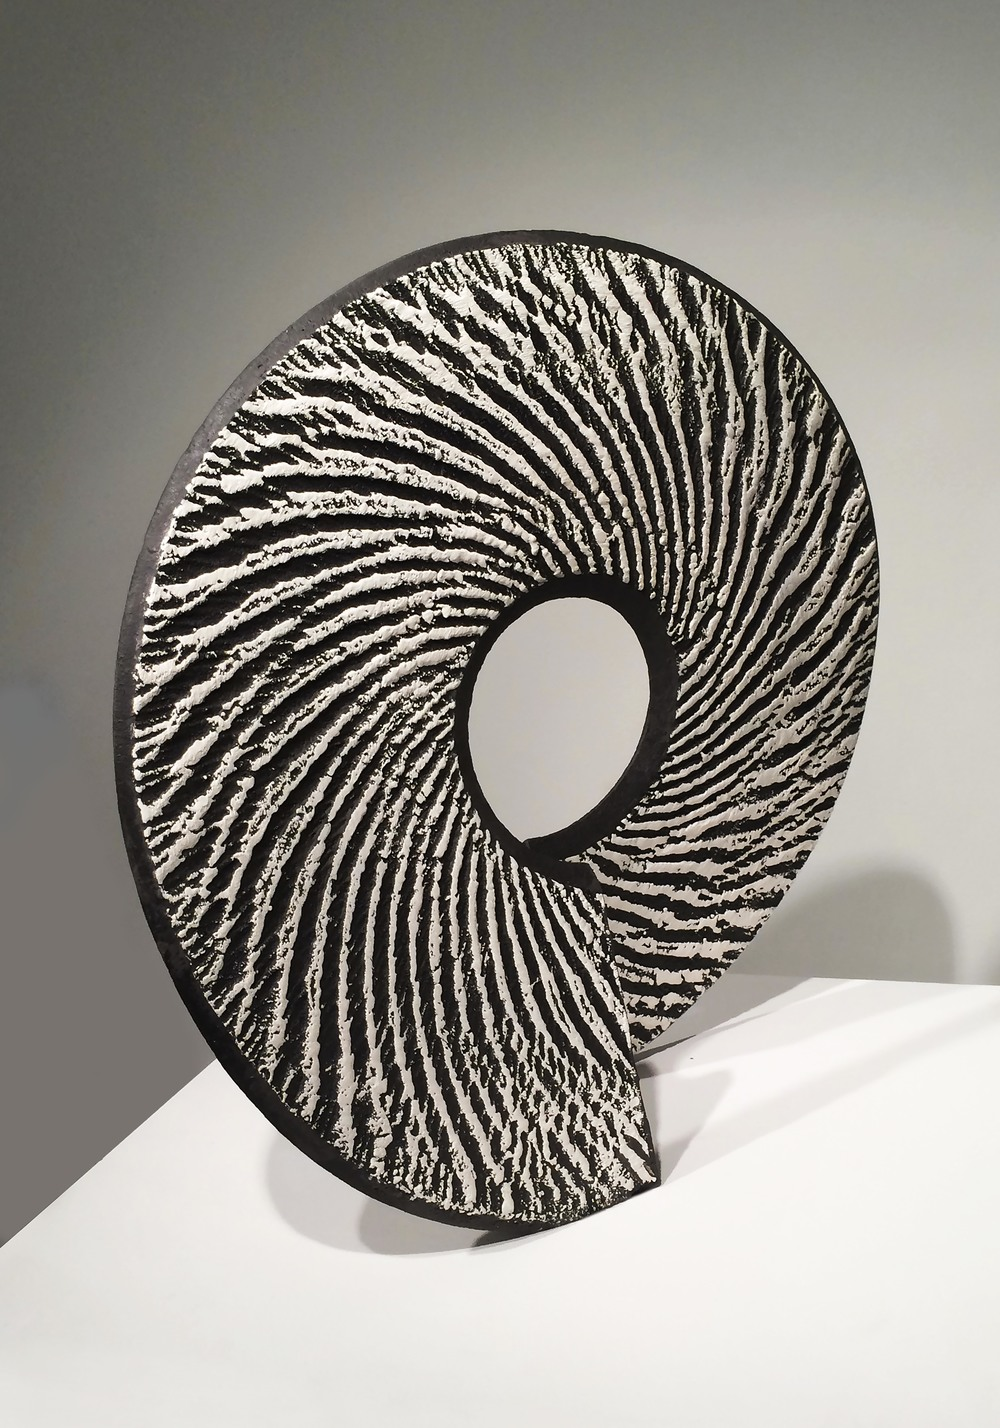 Black and White Coriolis 2013